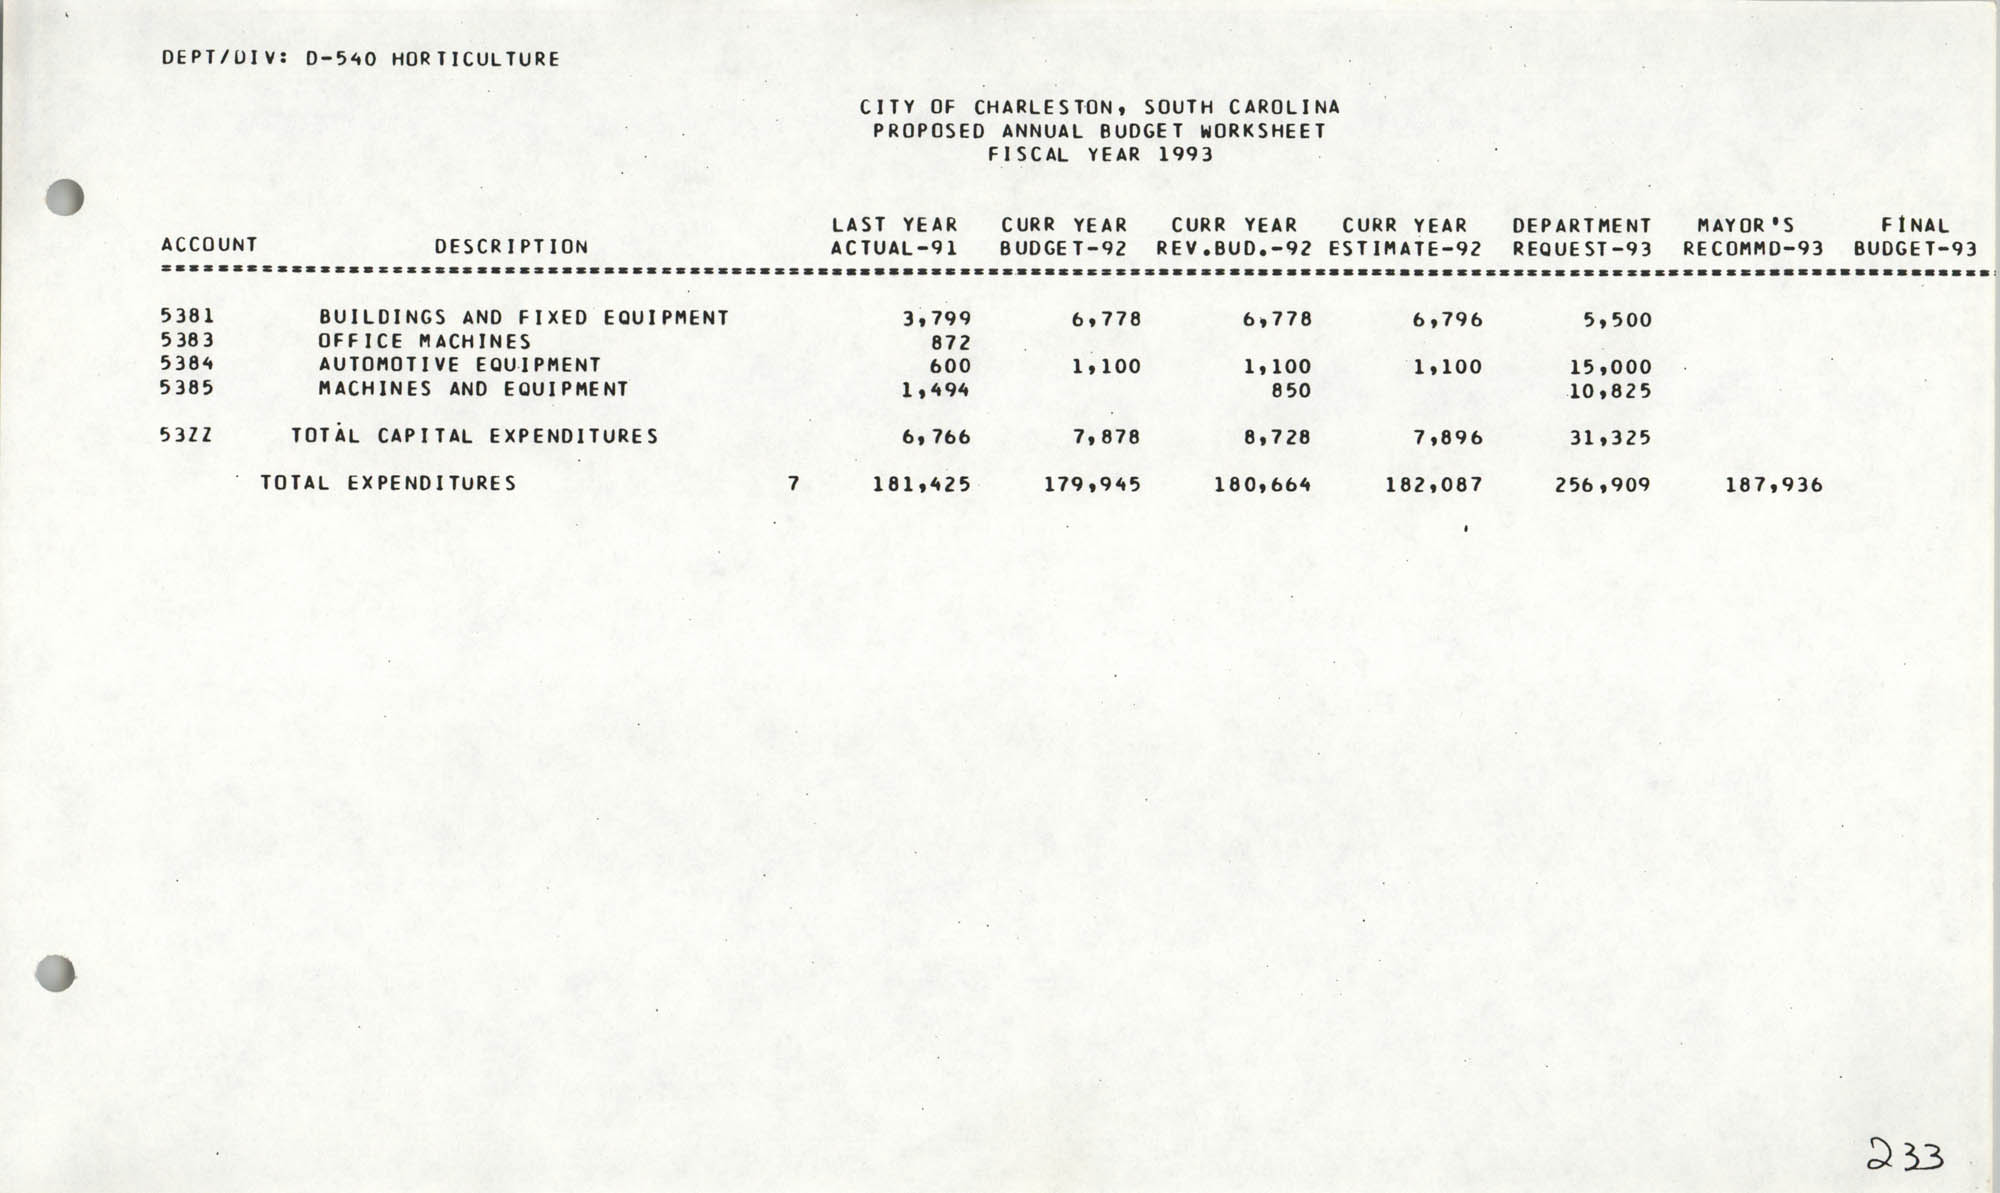 The City Council of Charleston, South Carolina, 1993 Budget, Page 233